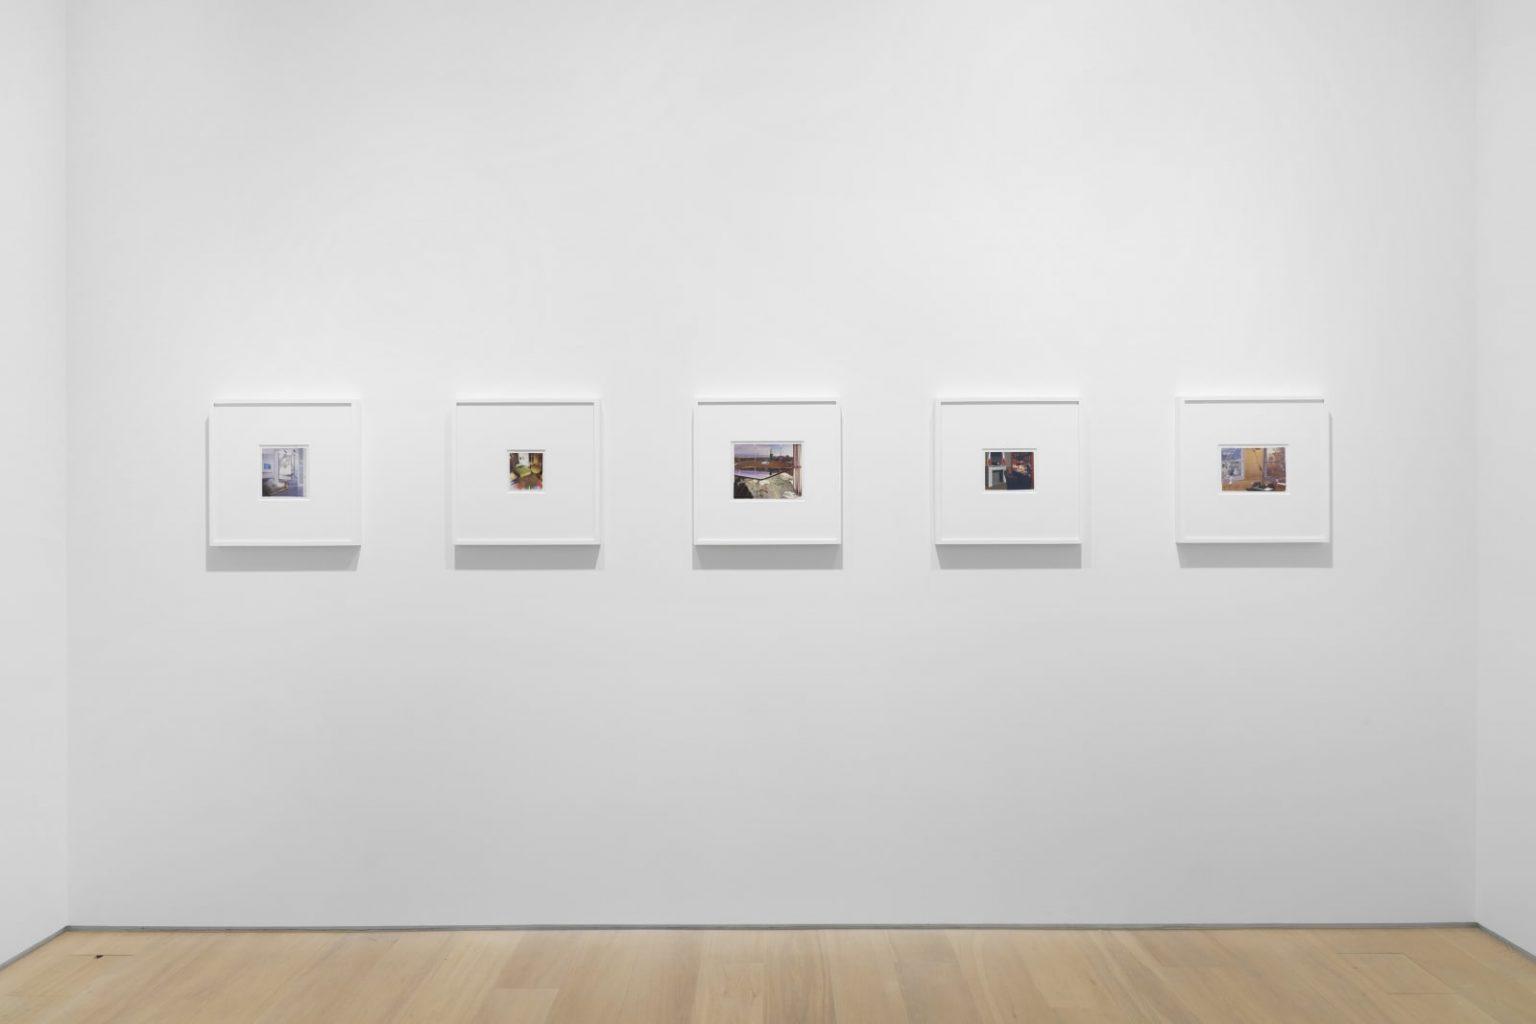 Dexter Dalwood, Collages 1999-2011, 2021 Simon Lee Gallery, London Photo: Ben Westoby